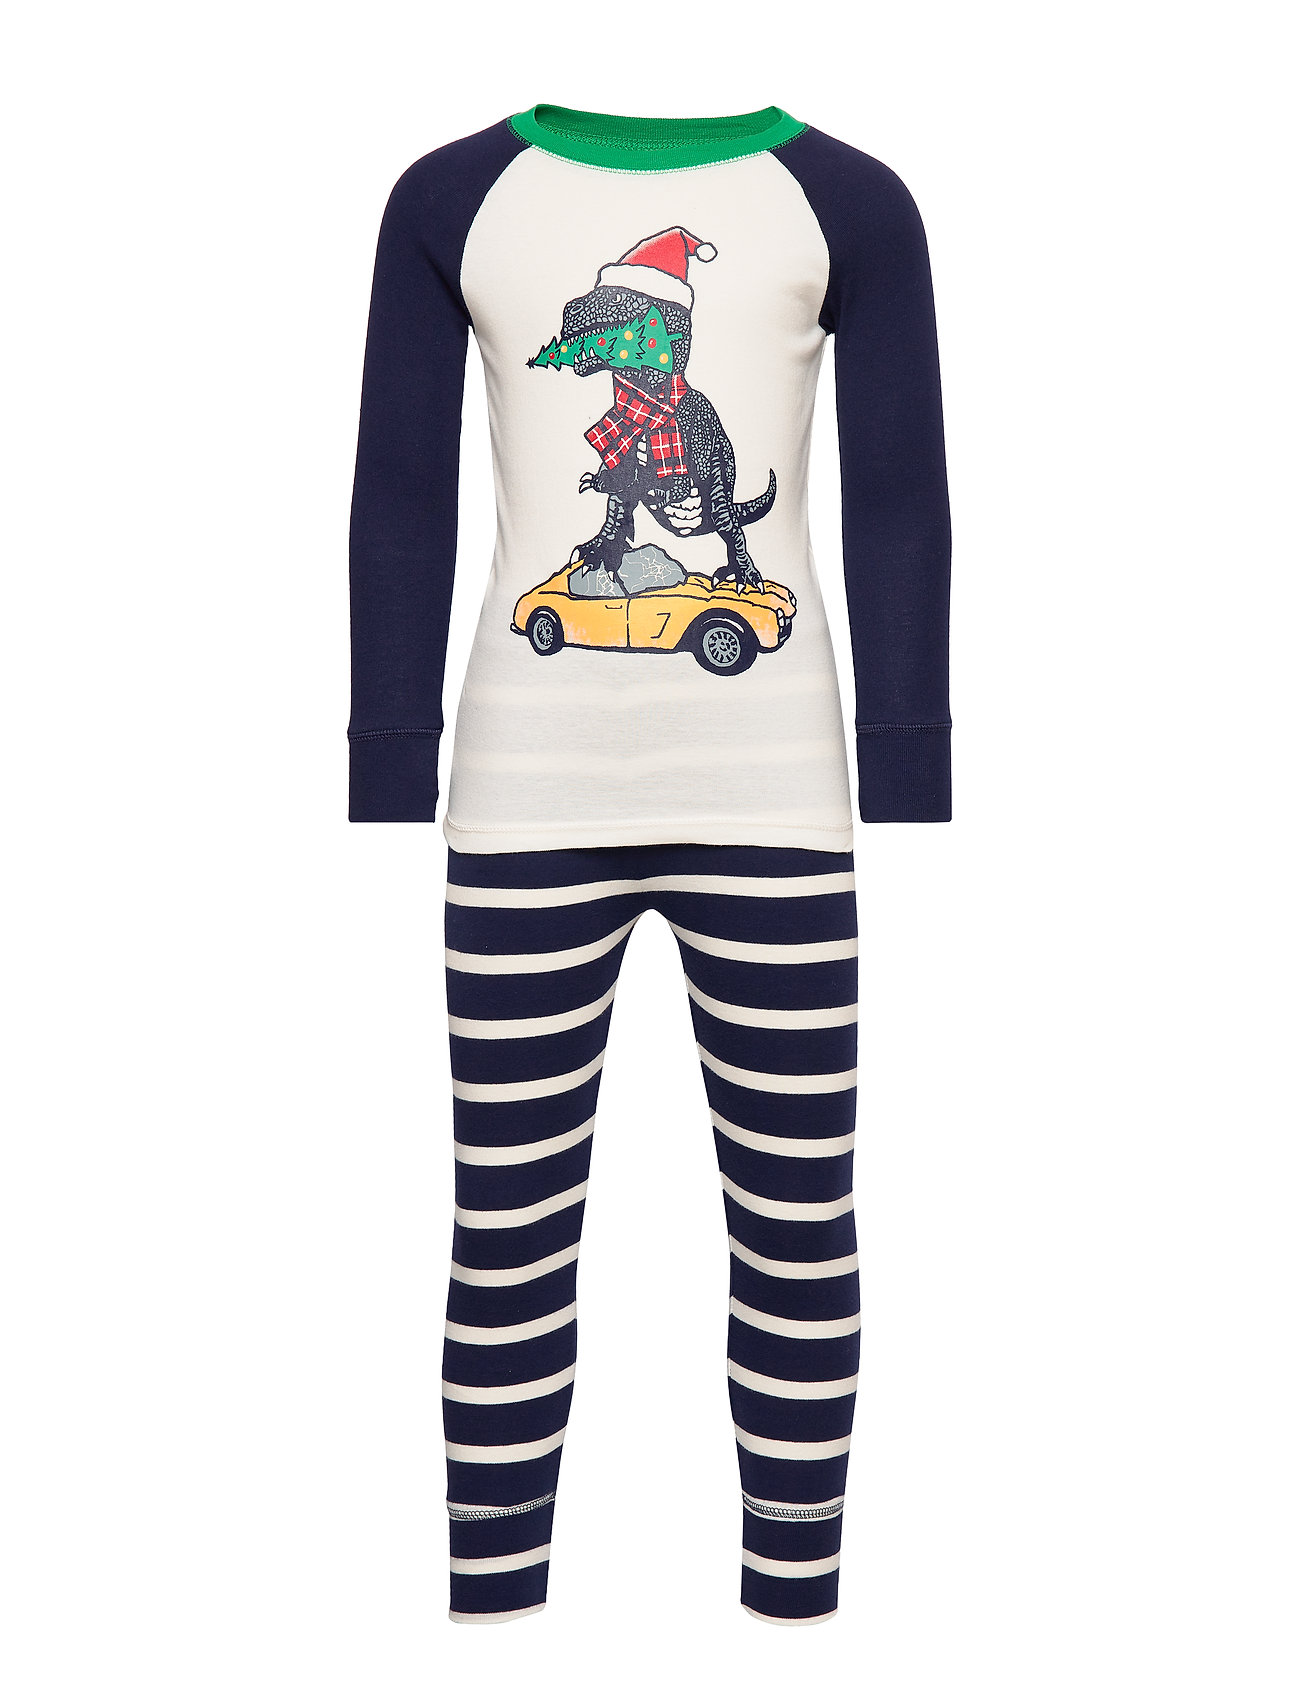 GAP Kids Holiday Dino PJ Set - GREEN STREET